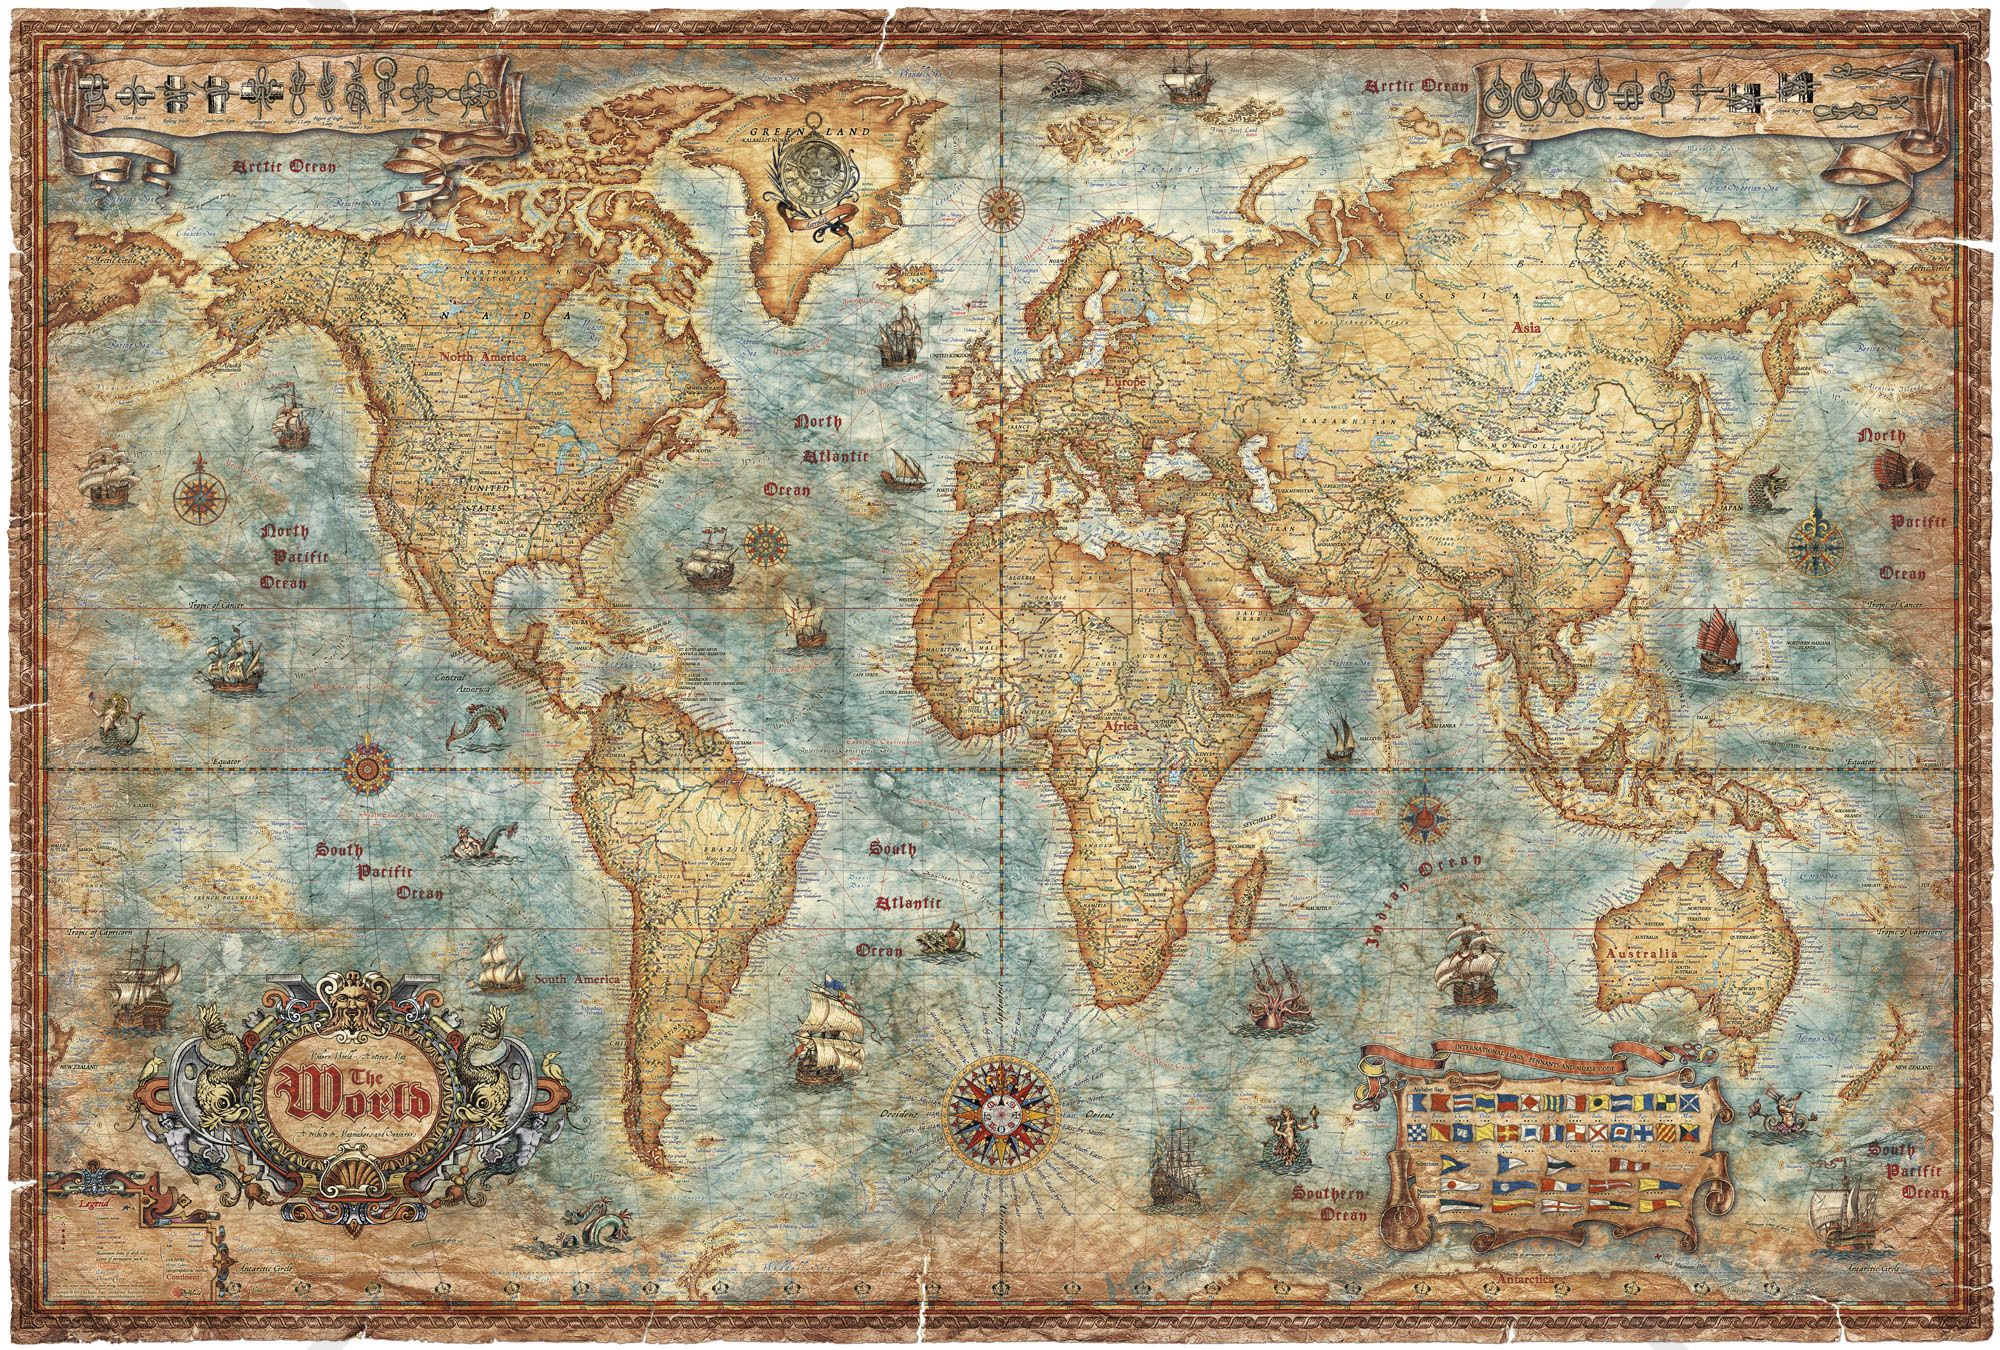 Modern world antique map fototapeter tapeter photowall modern world antique map fototapeter tapeter photowall gumiabroncs Images